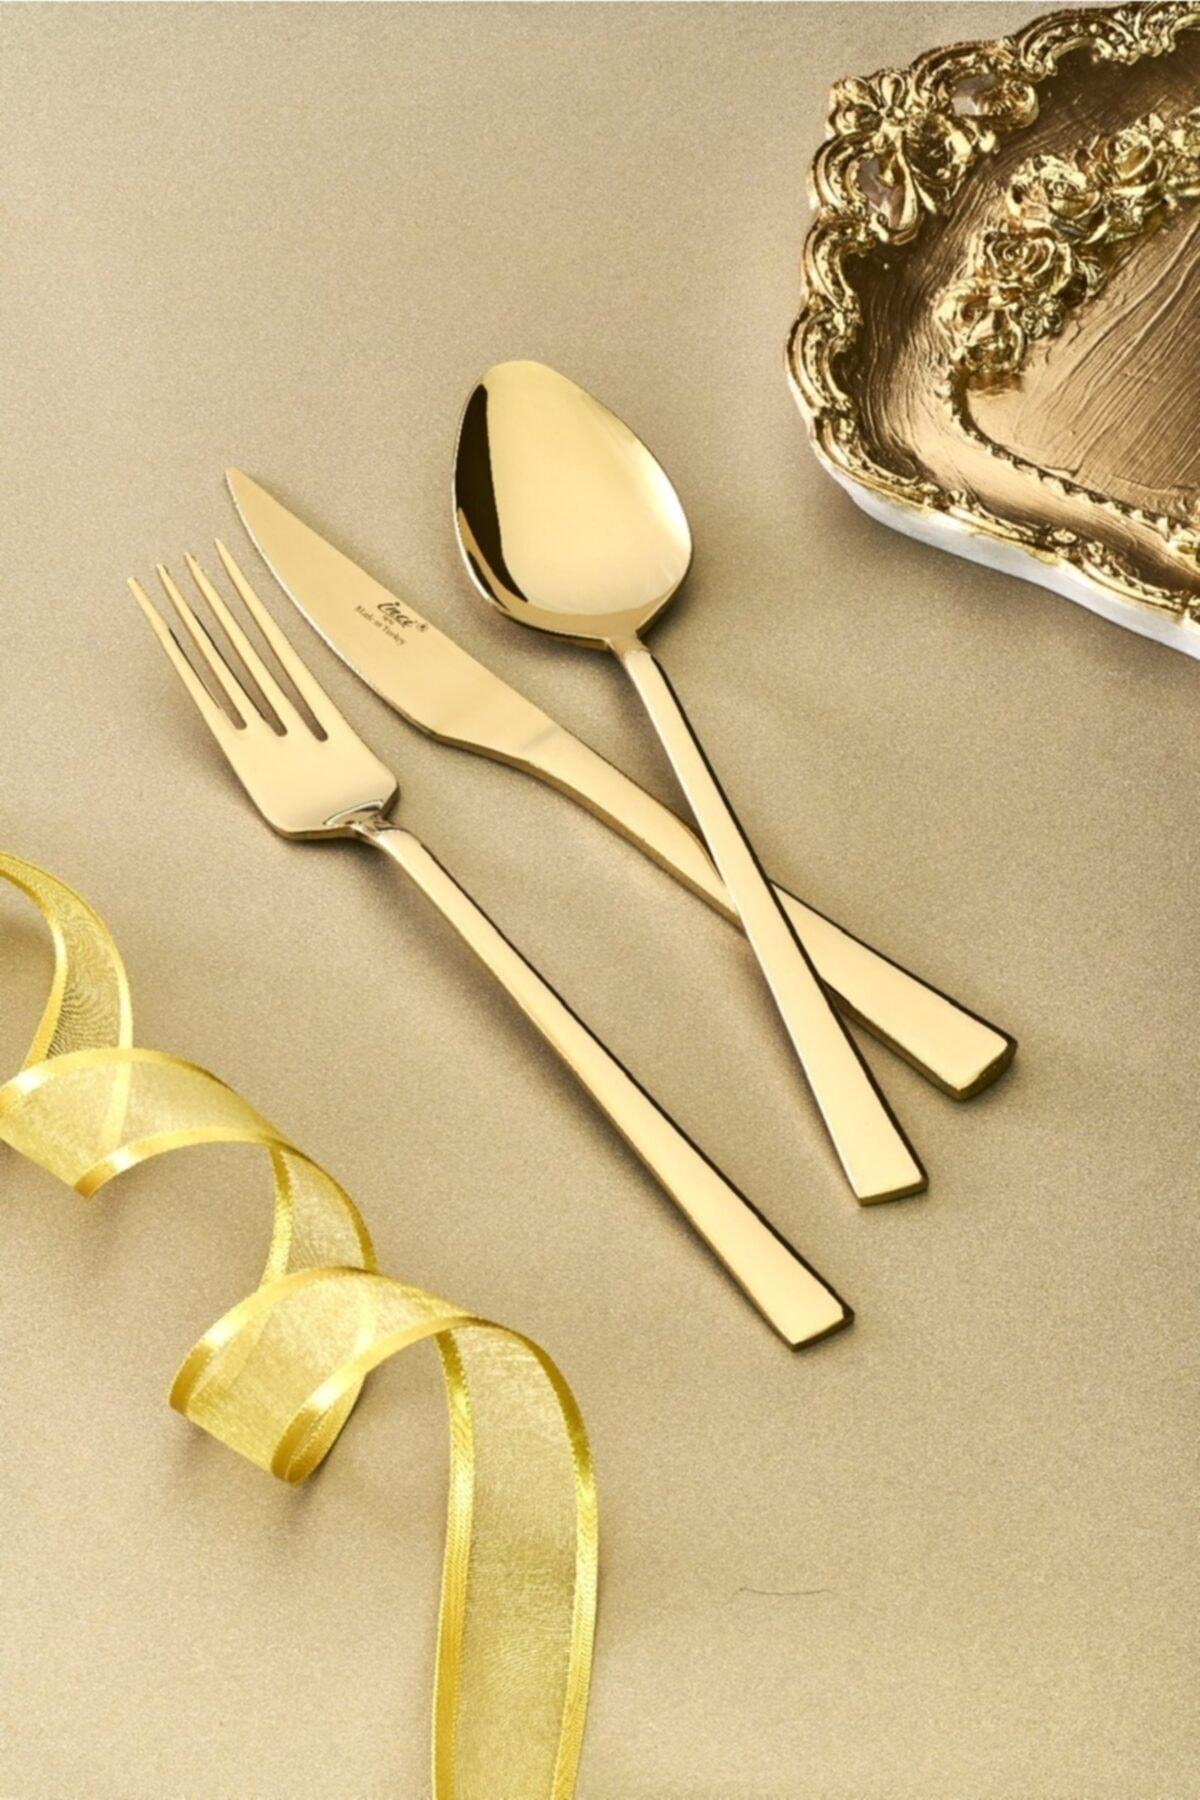 İnci Gold 36 Parça Çatal-kaşık-bıçak Seti 1